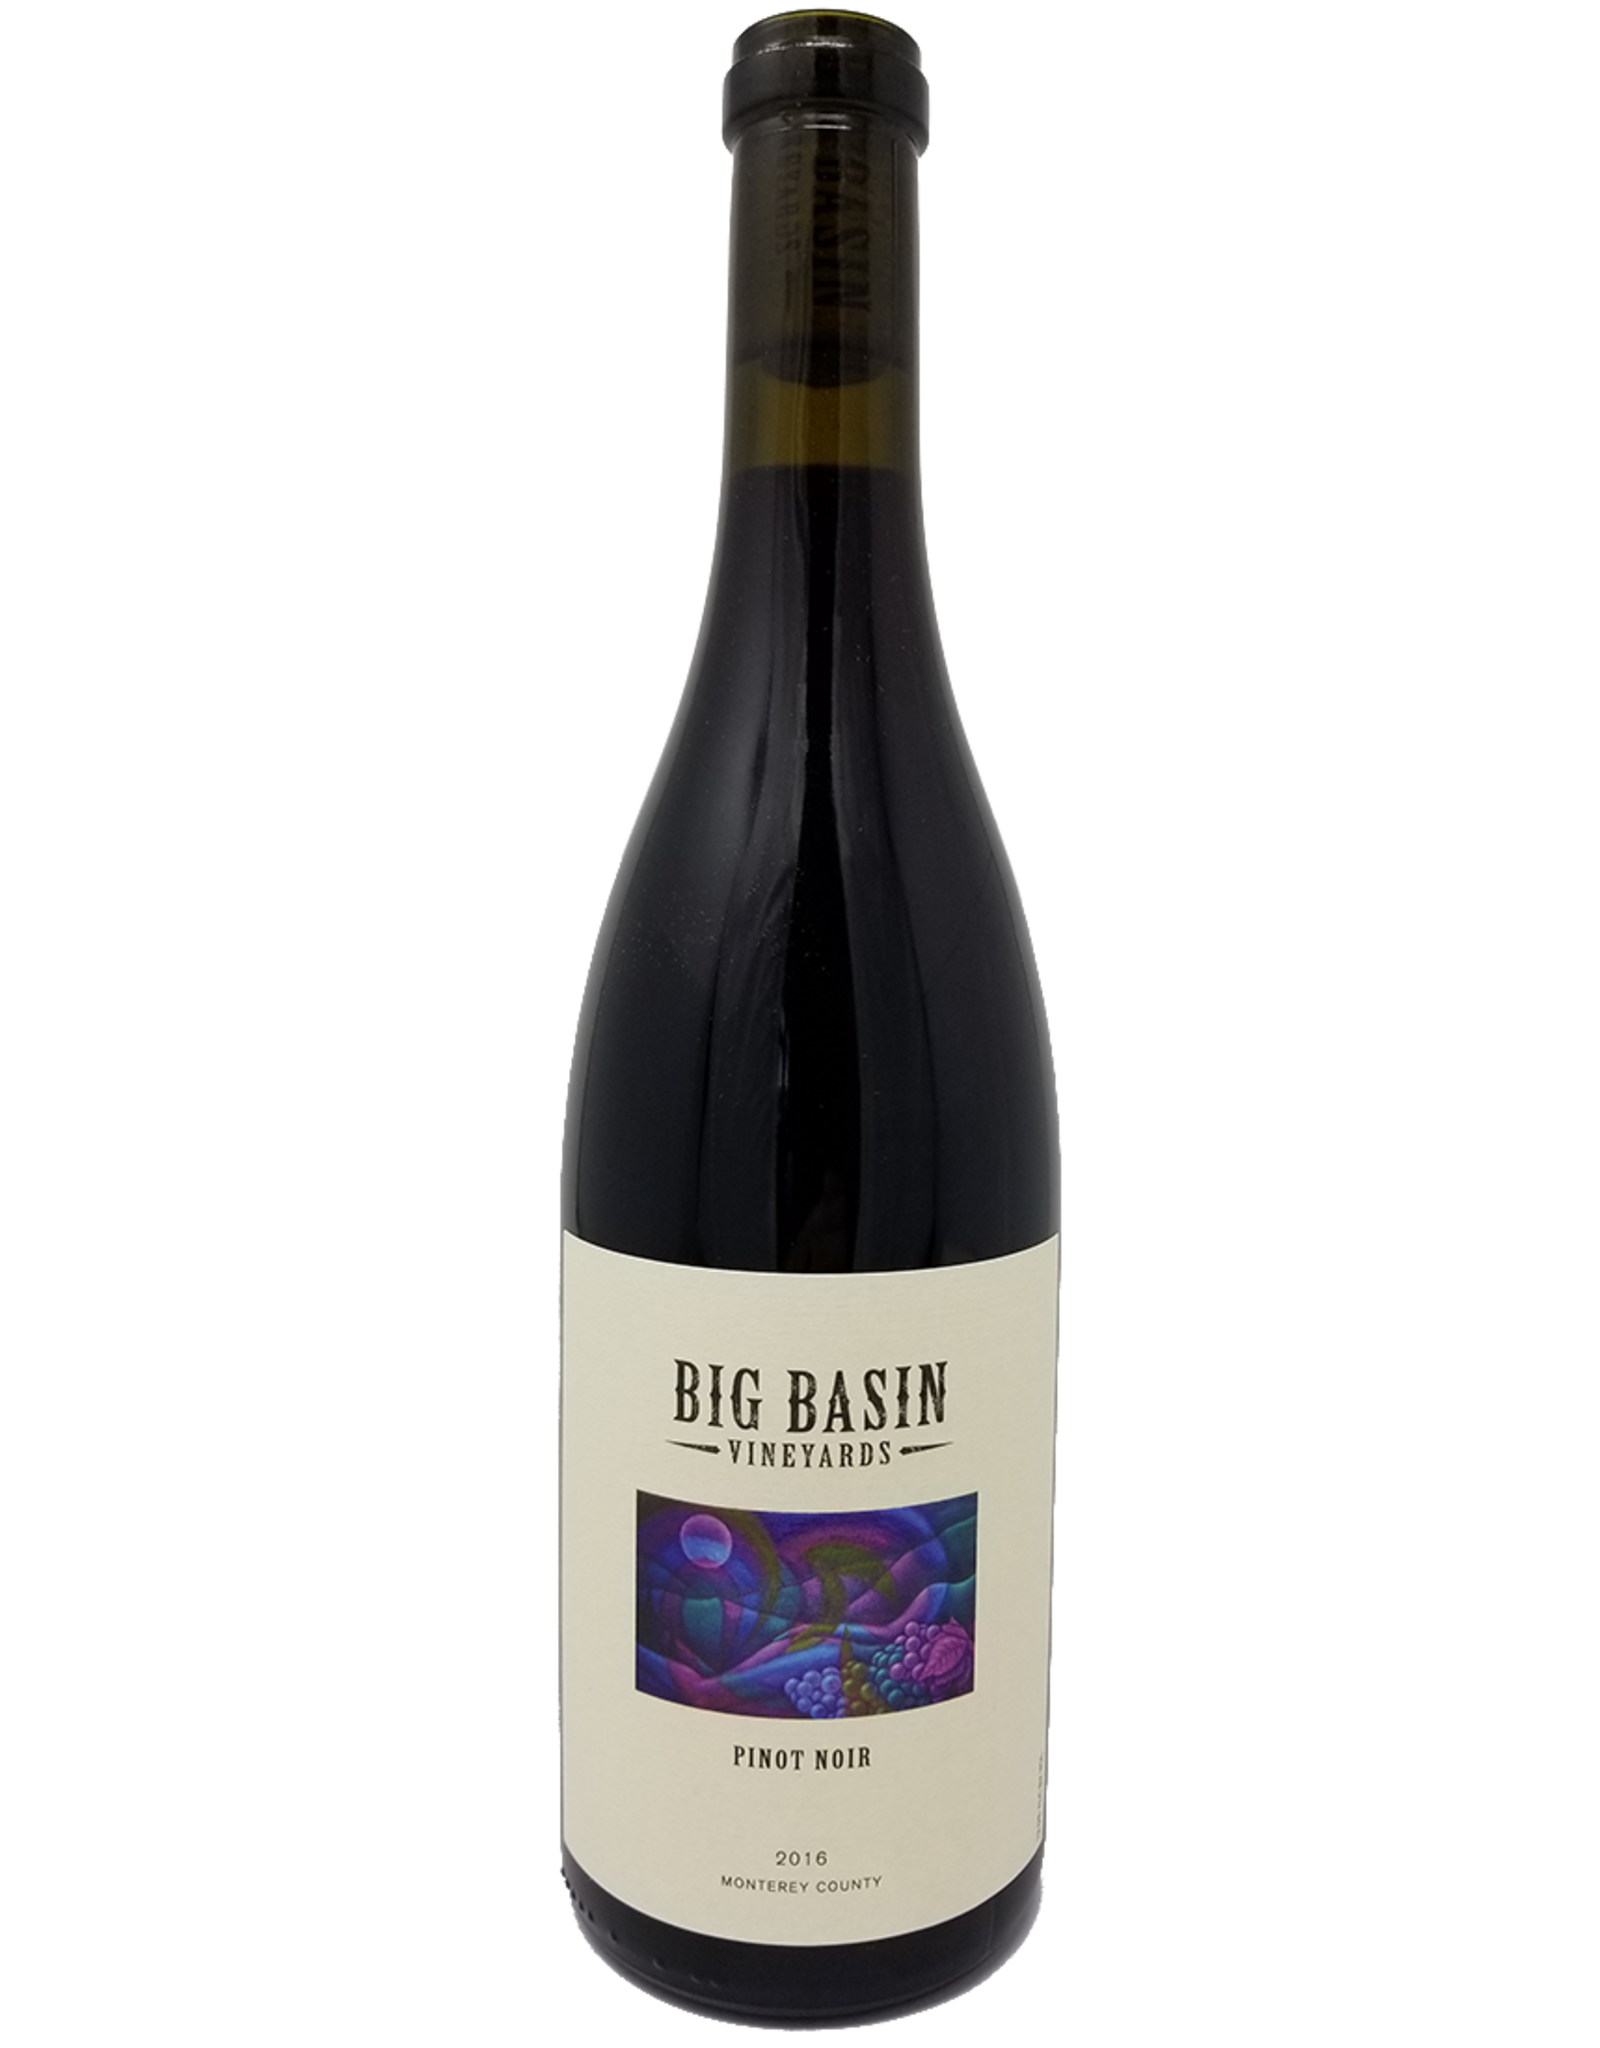 Big Basin Monterey Pinot Noir 2016